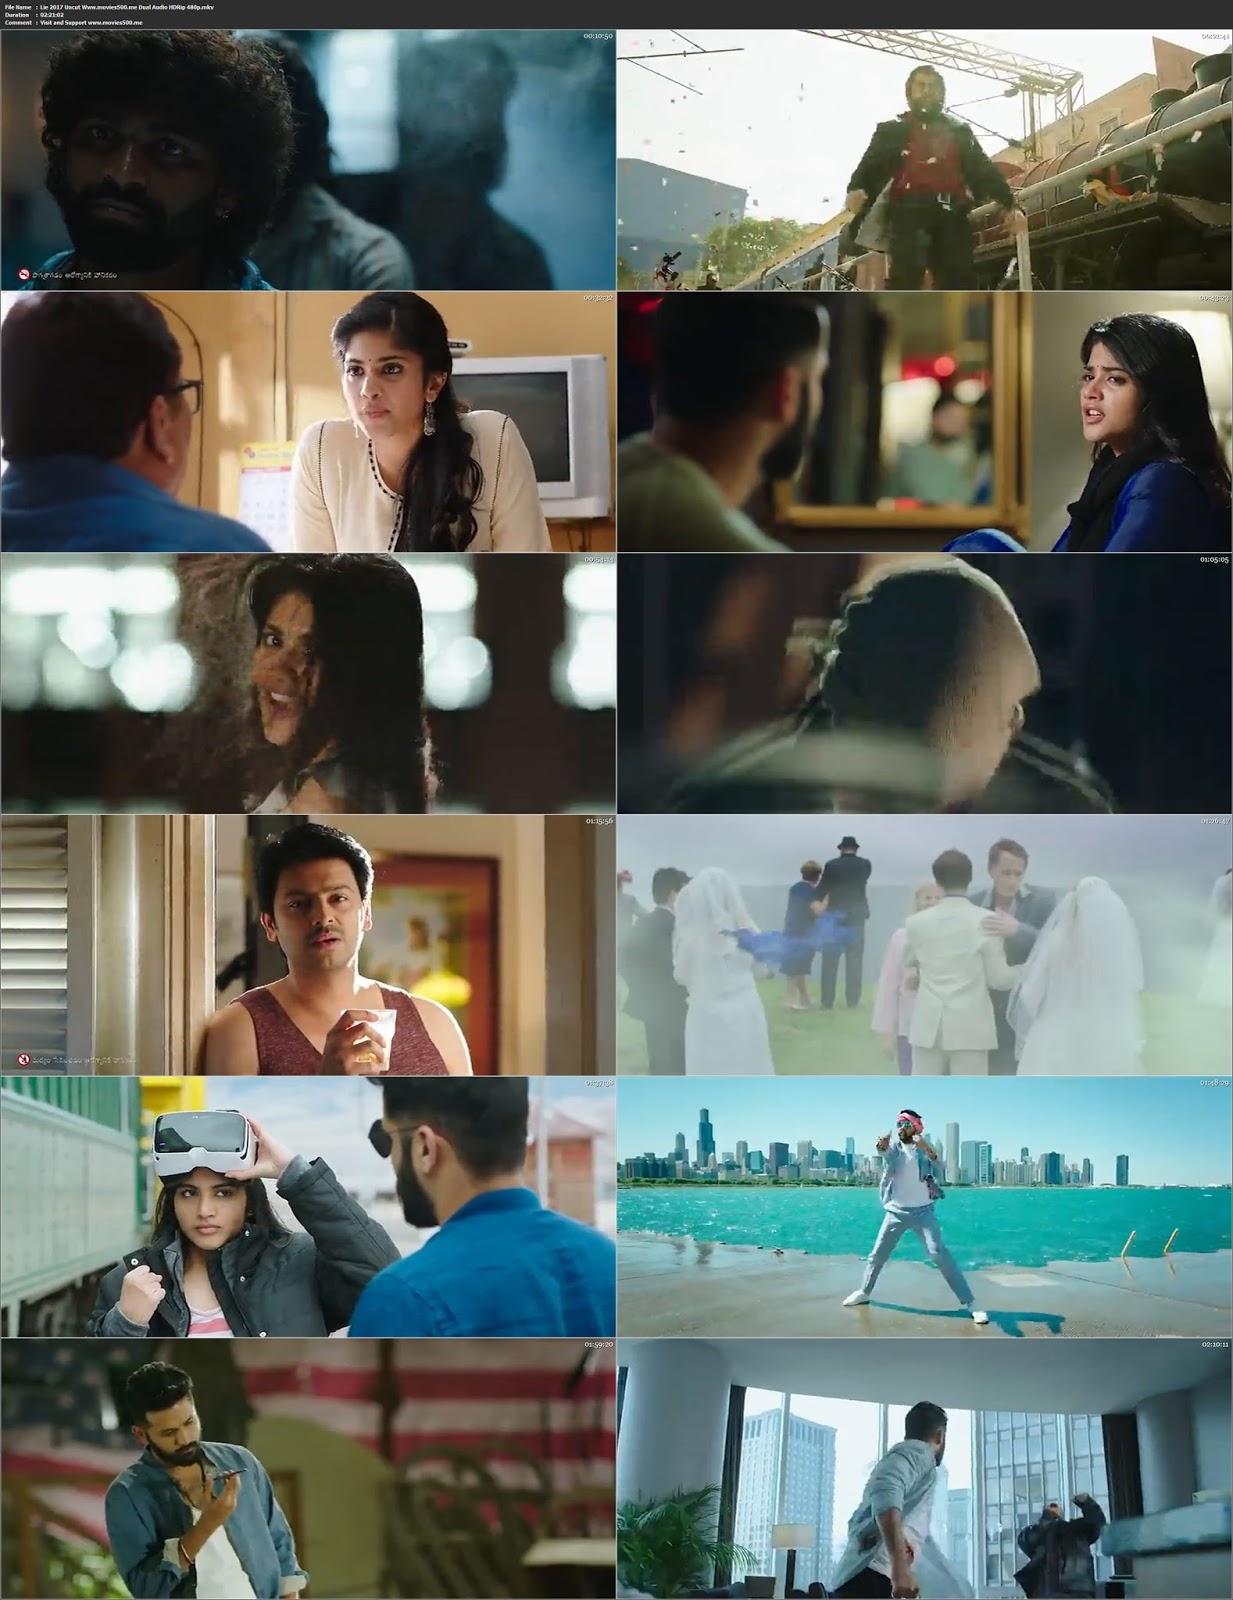 LIE 2017 Full Hindi Dubbed 400MB Movie HDRip 480p at movies500.info